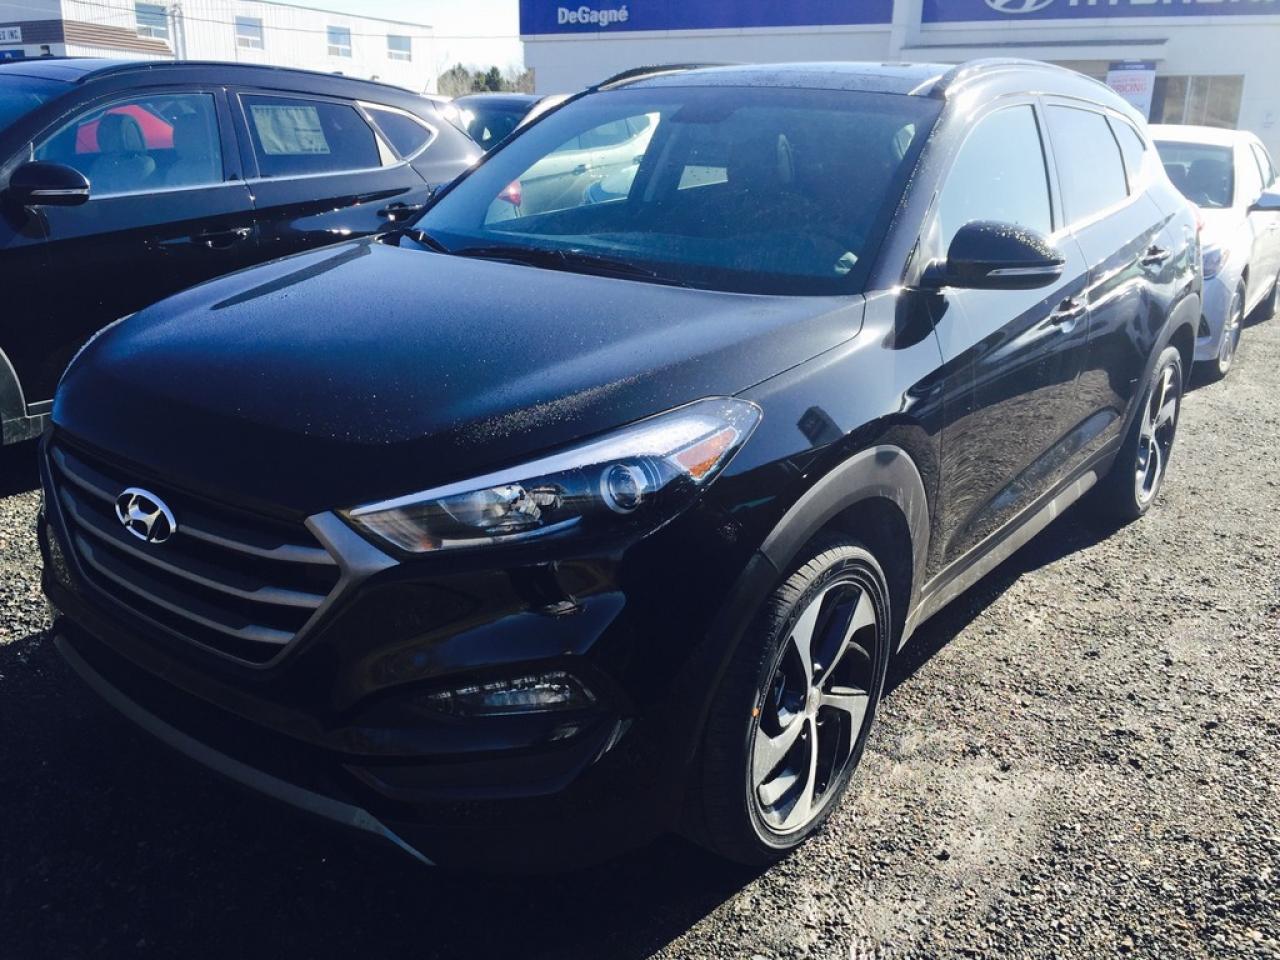 2016 Hyundai Tucson Limited 1.6T